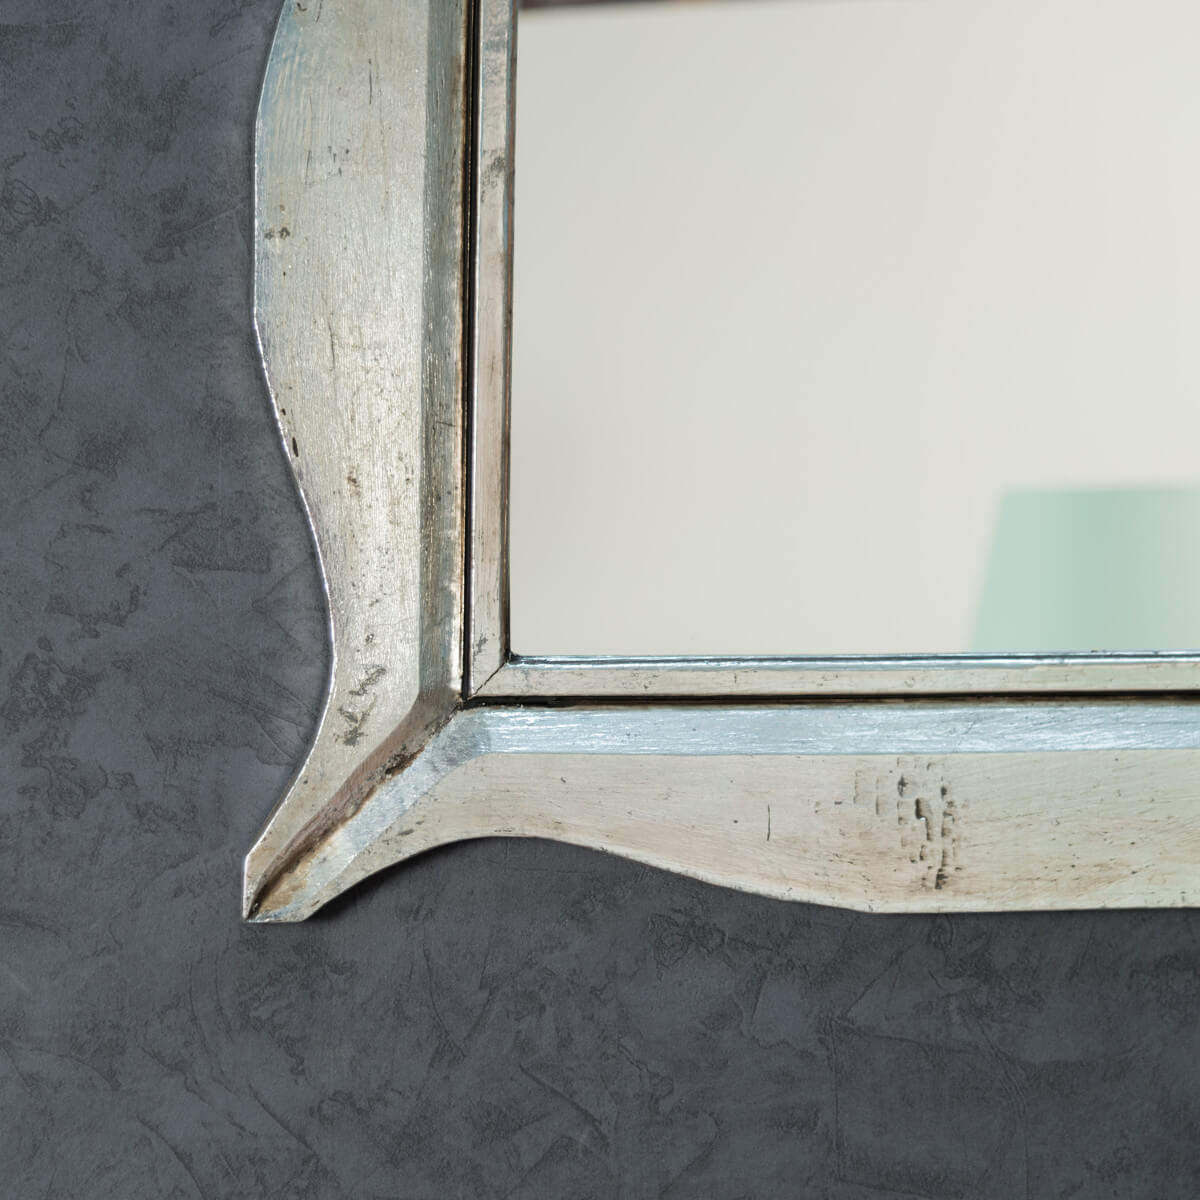 Neuf miroir moderne en bois patin argent 70 x 100cm ebay for Effet miroir psychologie definition